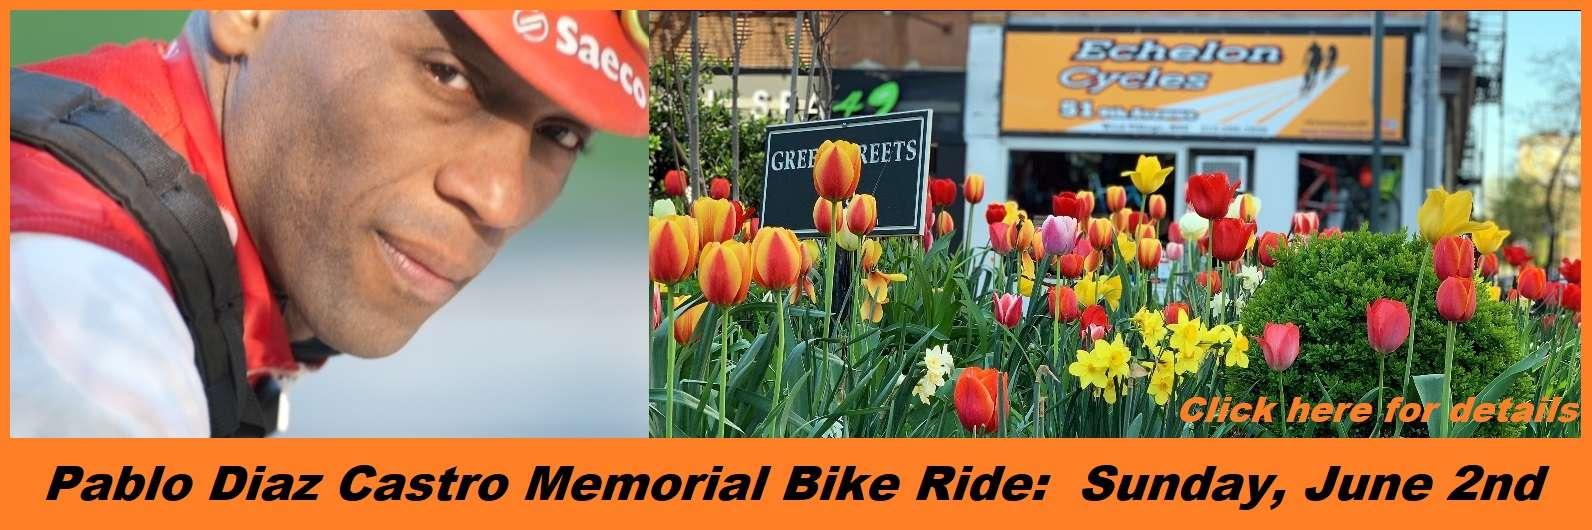 Pablo Diaz Castro Memorial Bike Ride